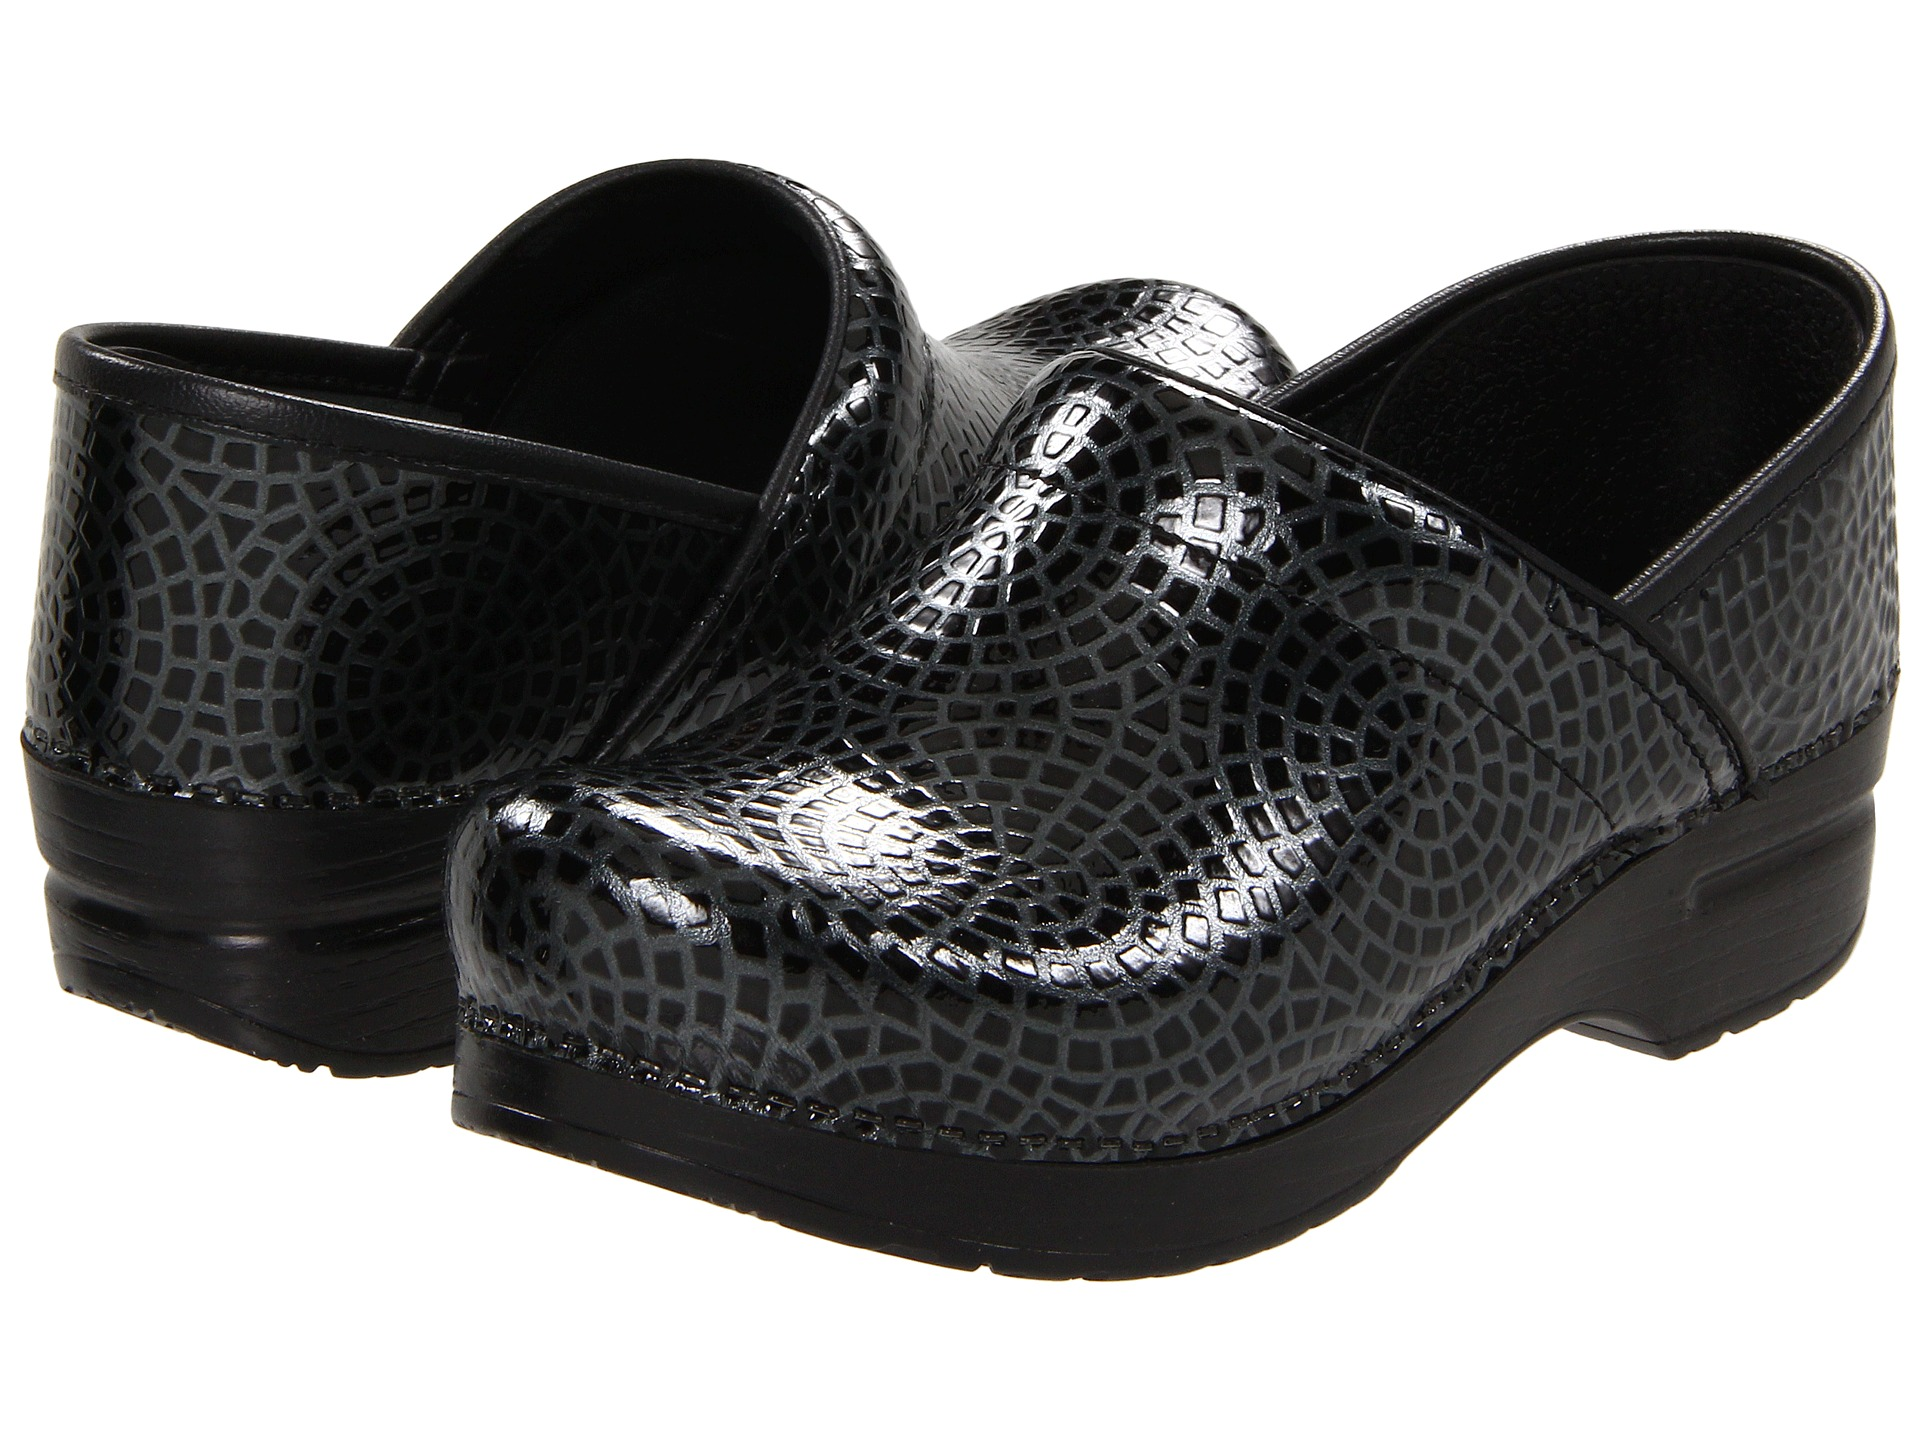 Discontinued Dansko Shoes Sale